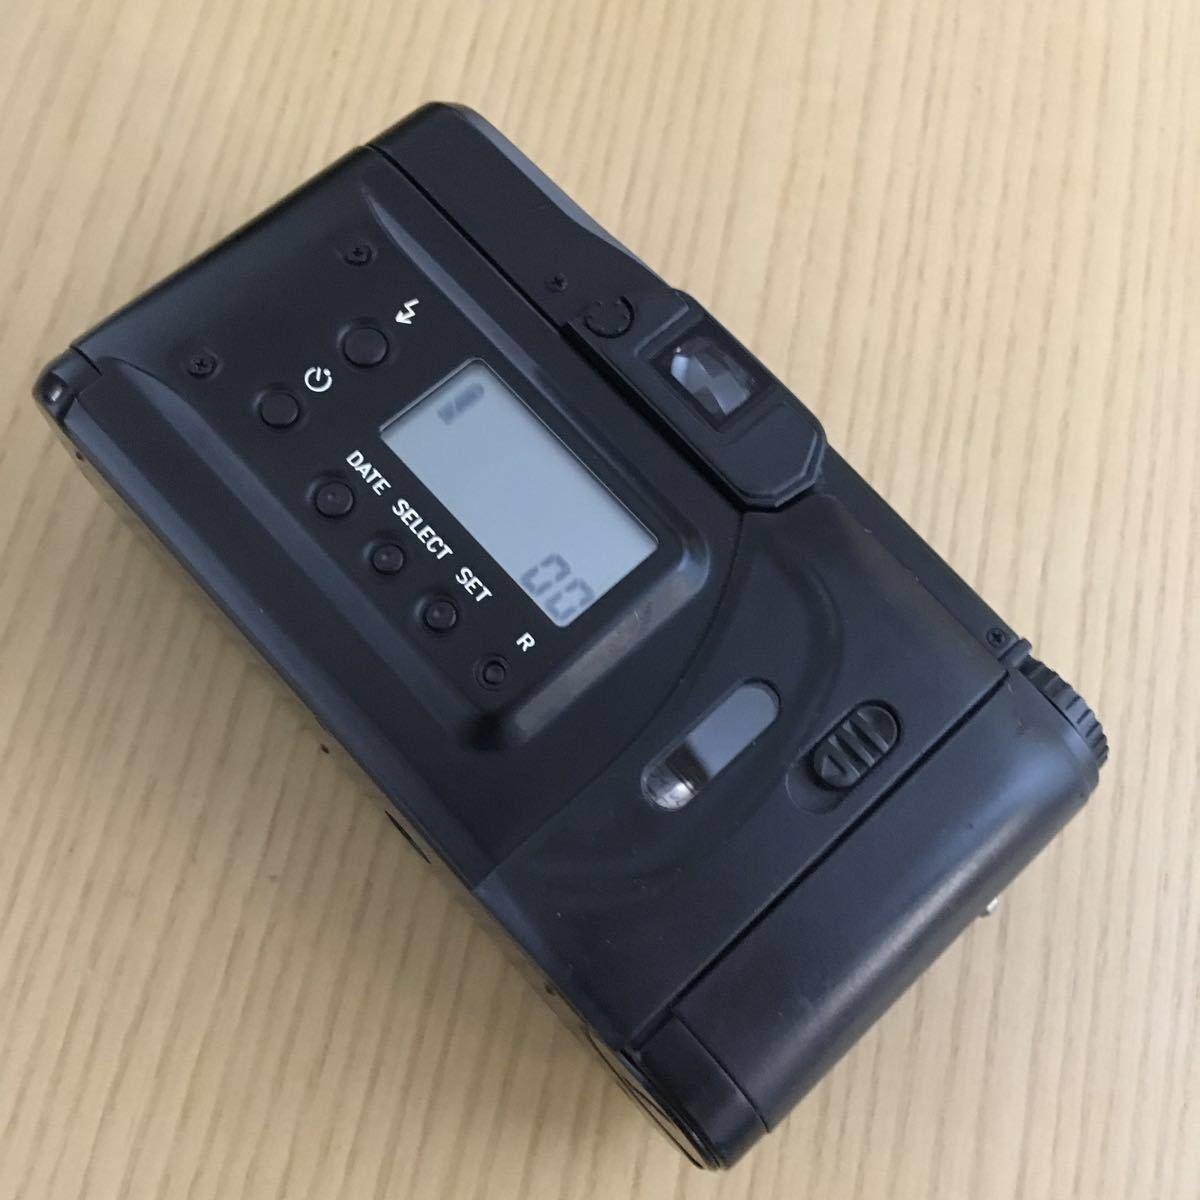 Contax TVS Ⅲ ブラック(Carl Zeiss Vario Sonnar 30-60mm f3.7-6.7) T vs 3 動作写りOK 概ねキレイ ストラップ2種 革ケース 説明書 内外箱_画像7